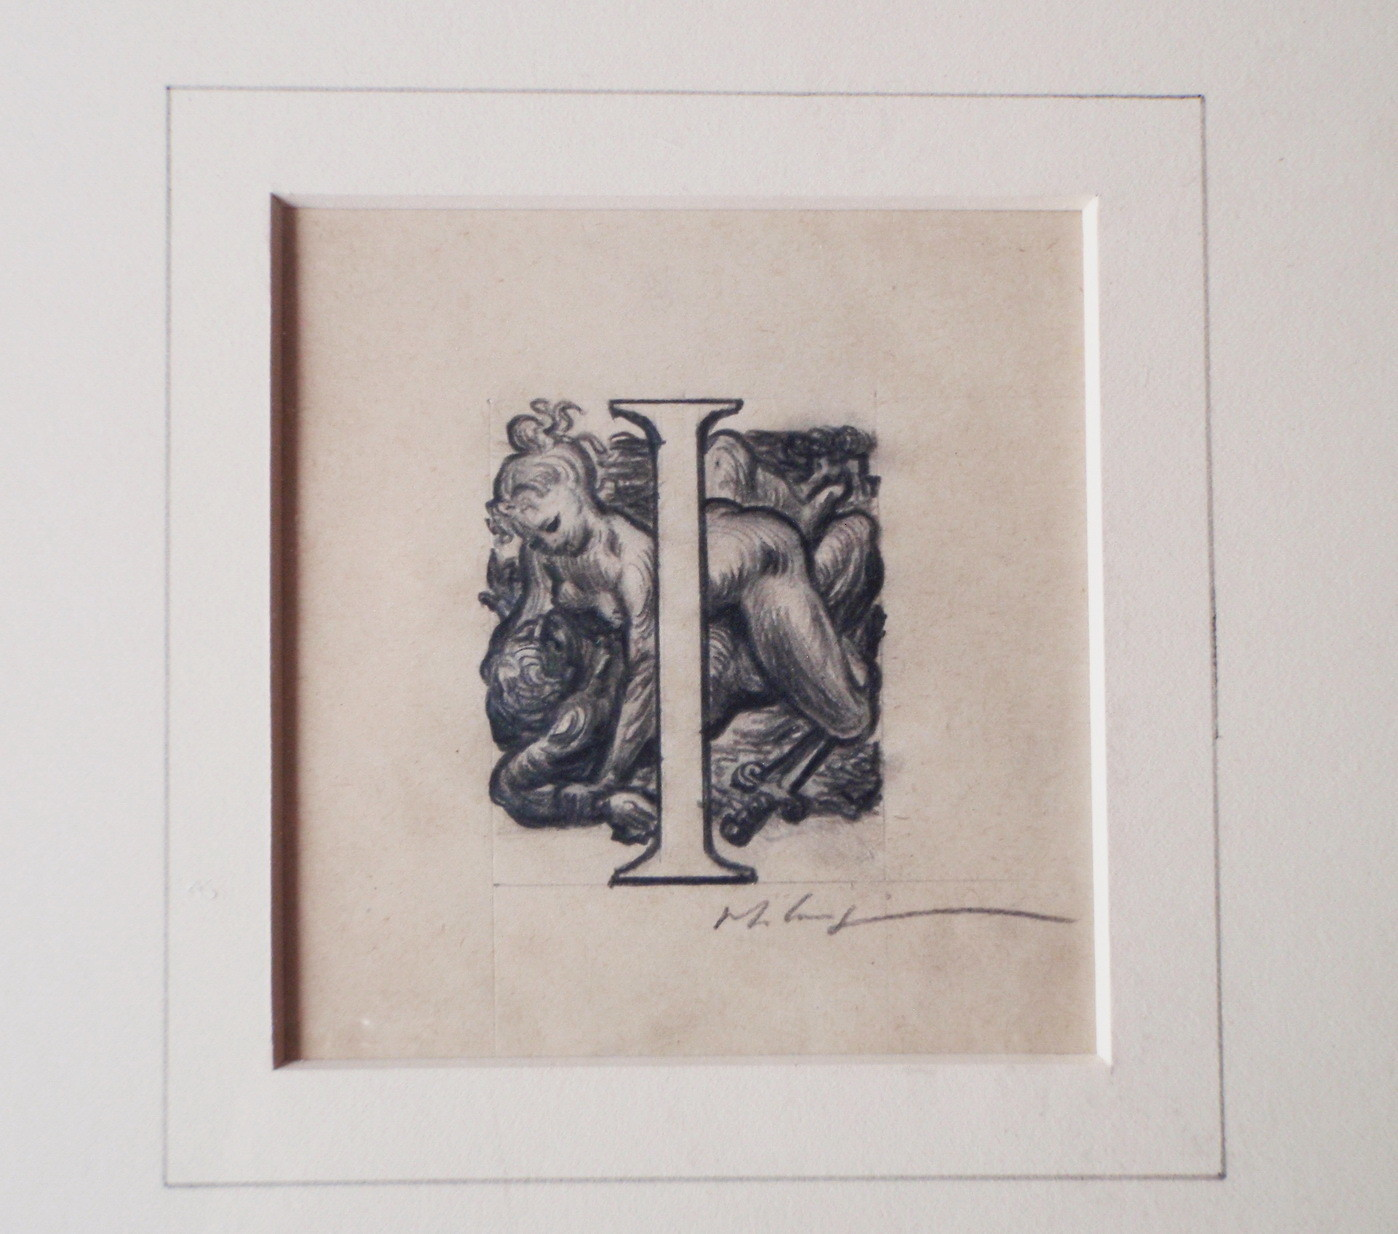 Original Valentine le Campion Erotic Drawing and Woodcut Engraving 1935